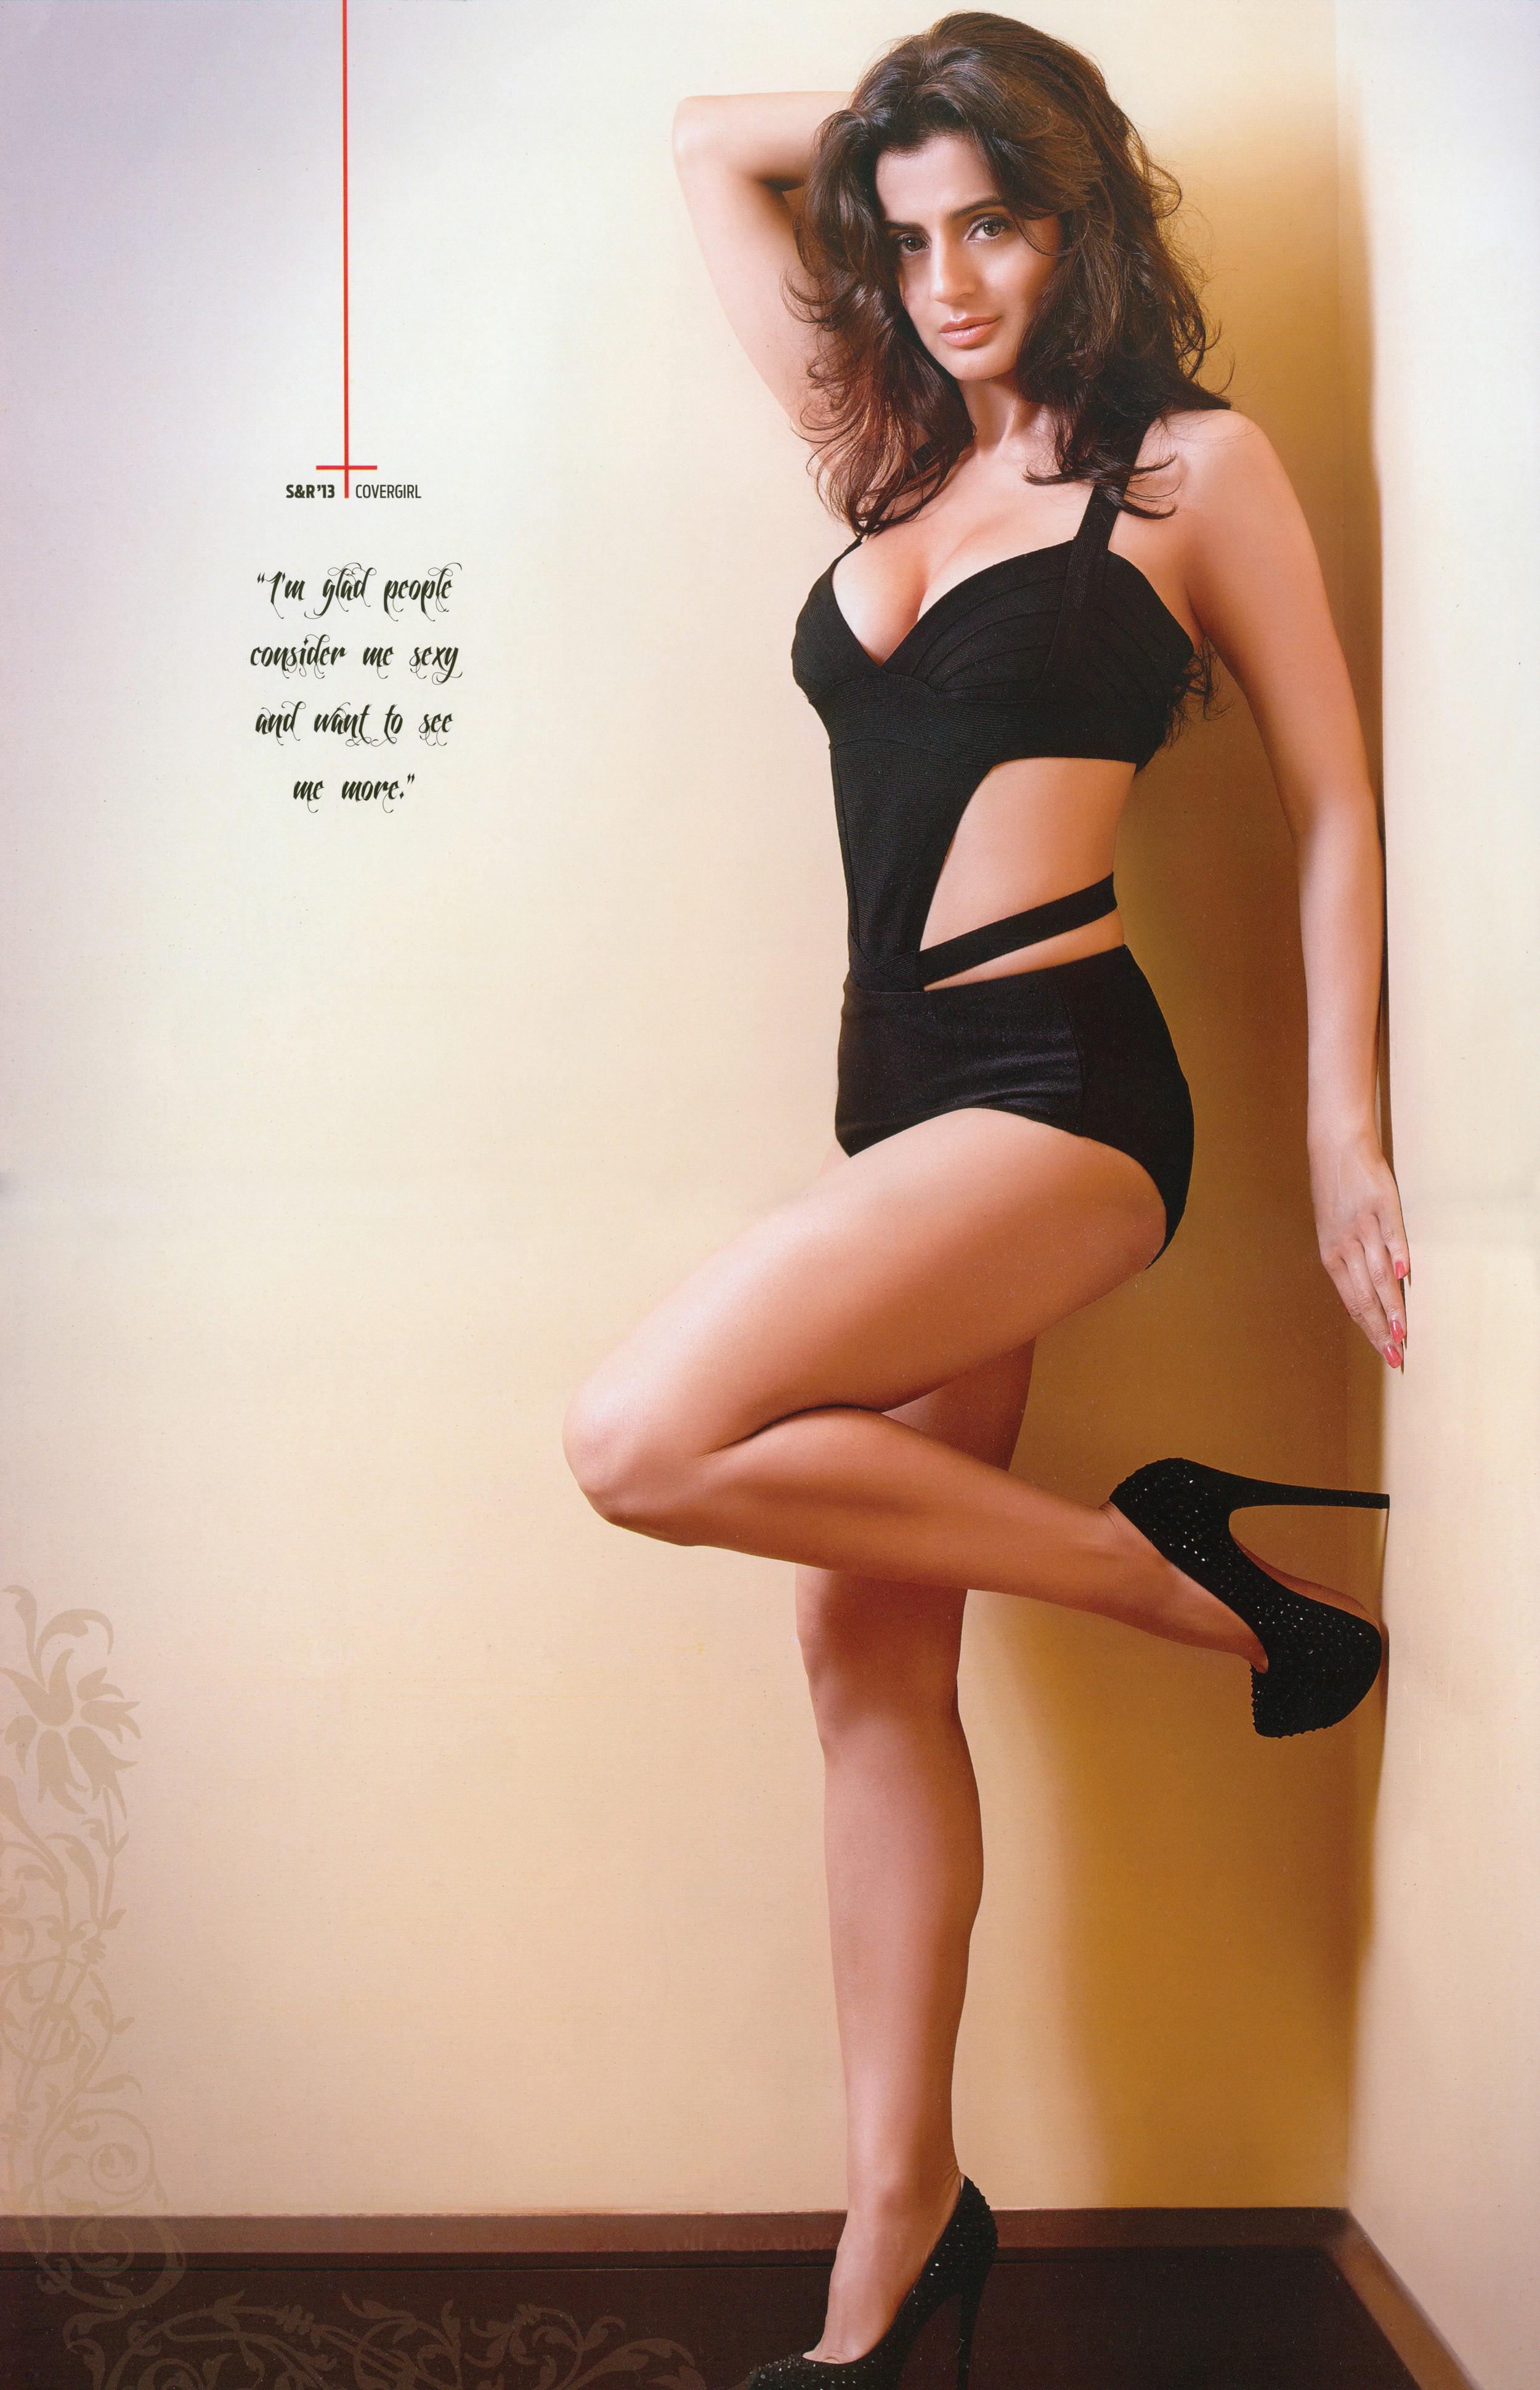 Facebook Covers For Ameesha Patel [13-24] • PoPoPics.com